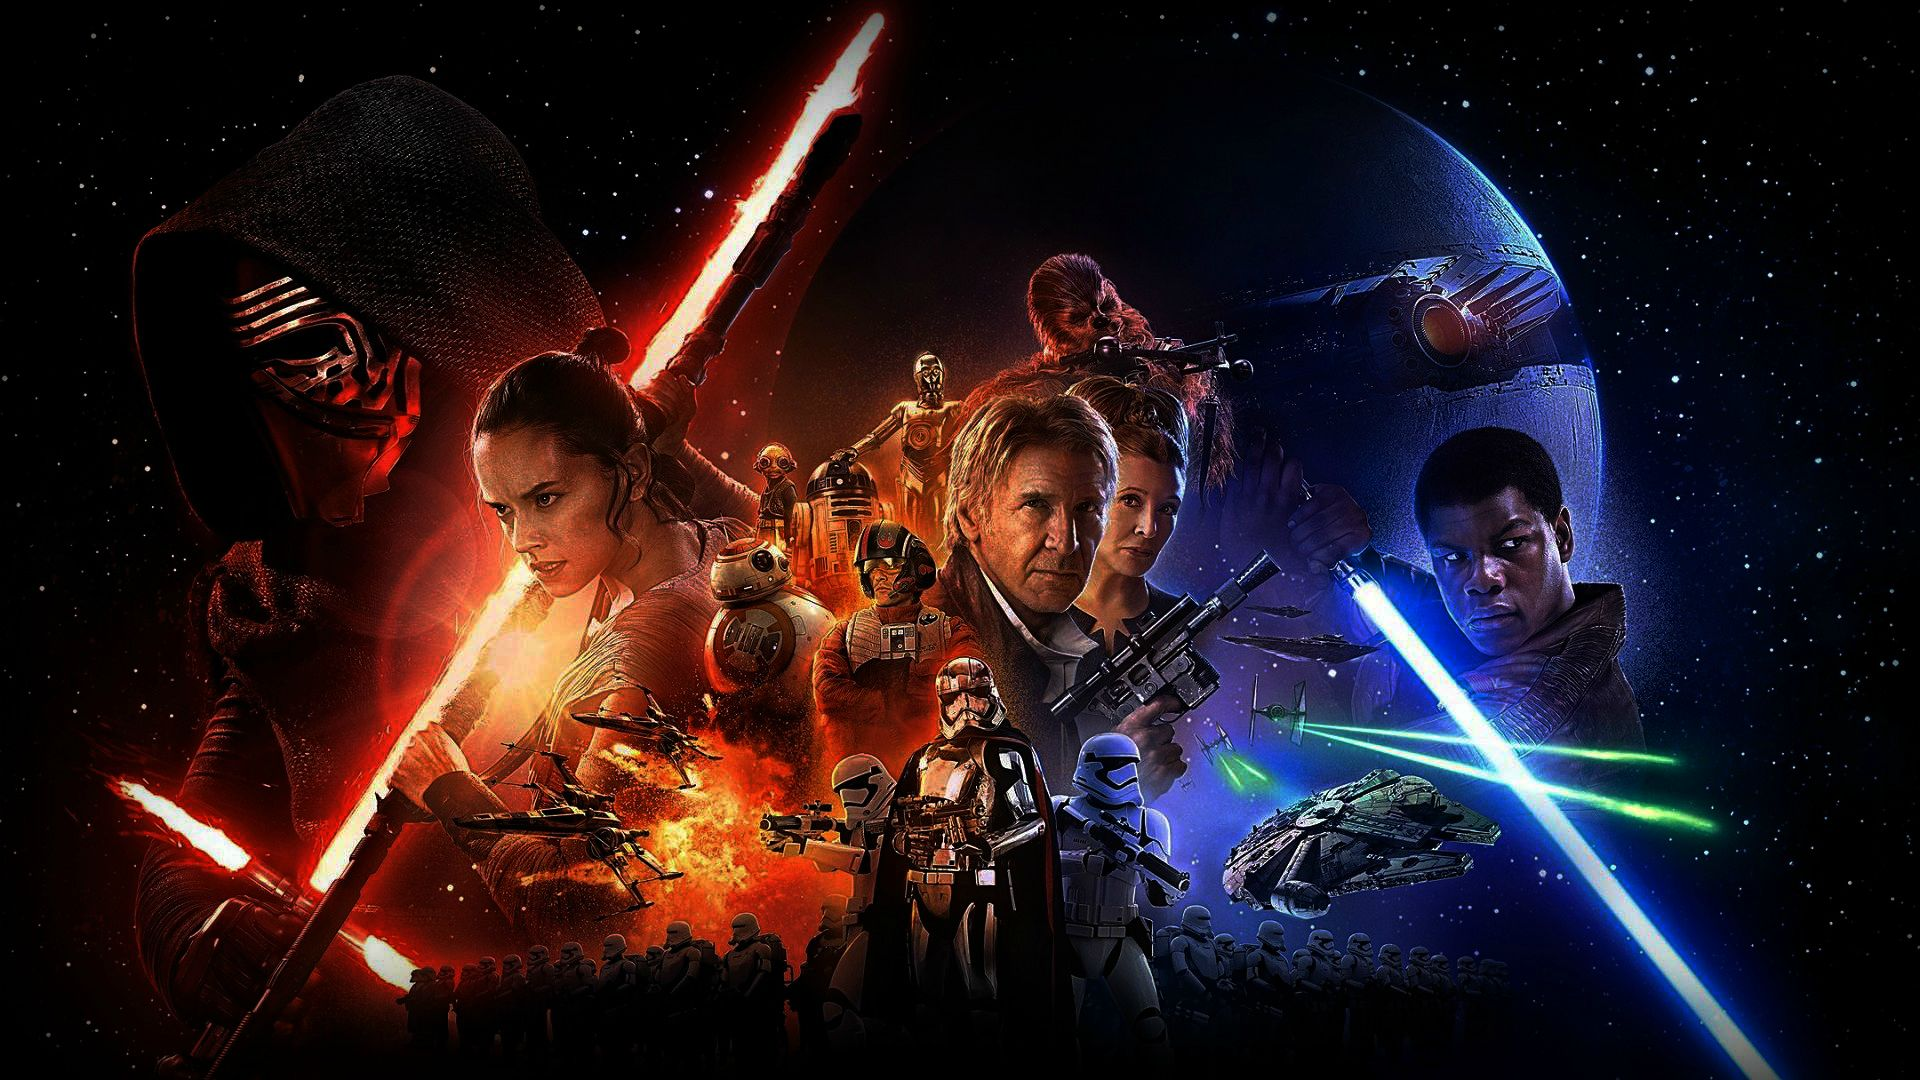 2 26 The Force Awakens Three Views On